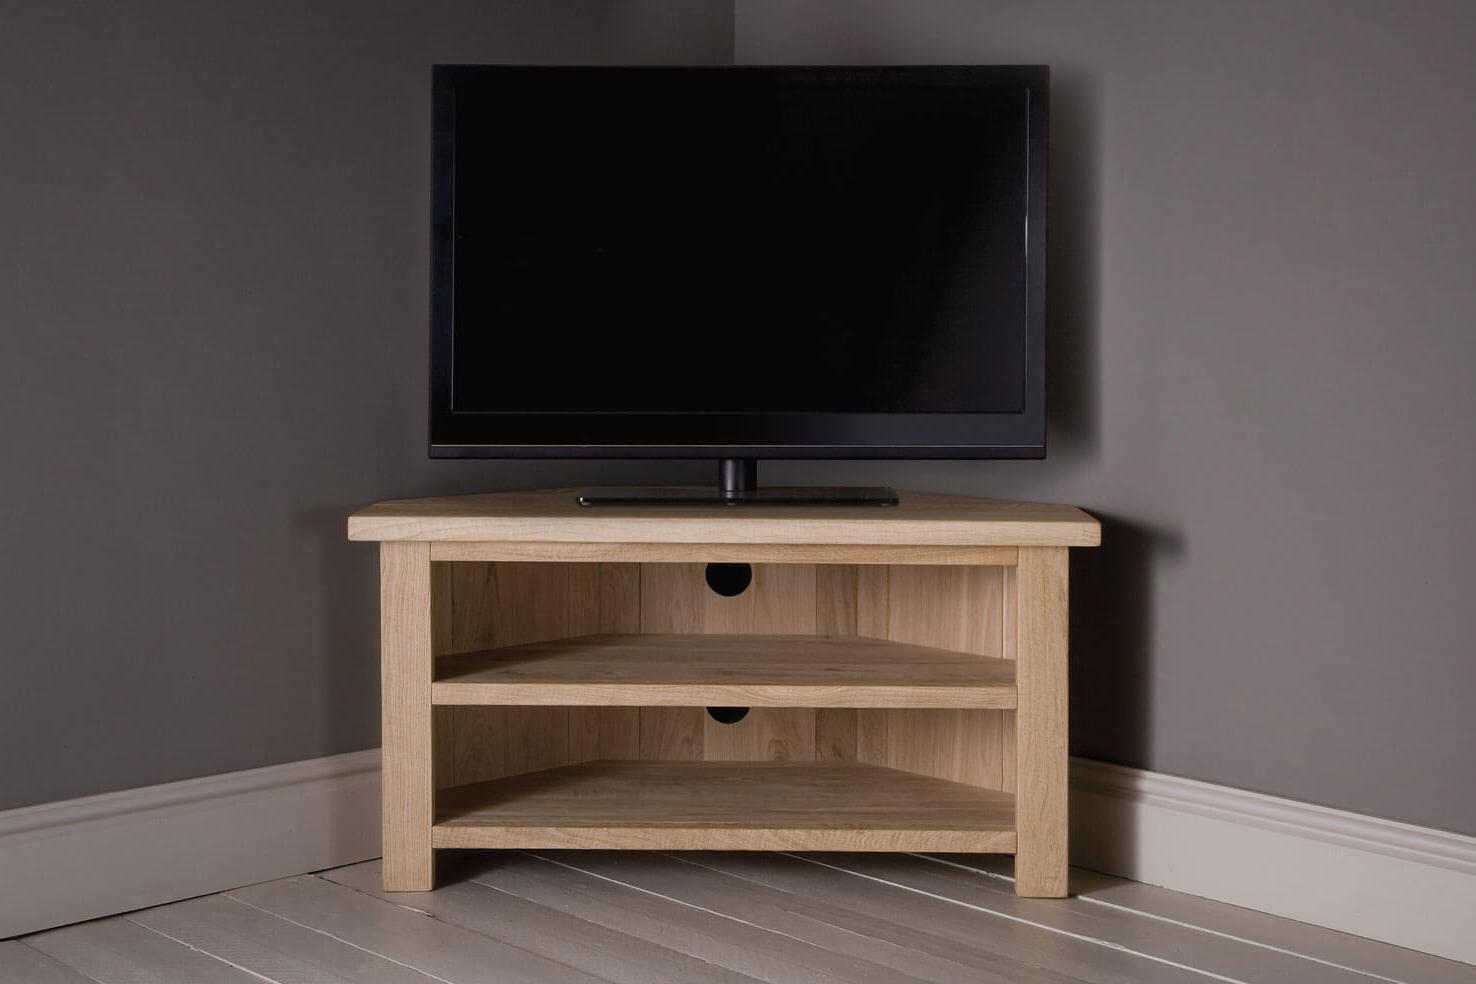 Corner Wooden Tv Cabinets In Recent Oak Corner Tv Unit With Shelfindigo Furniture (View 4 of 20)